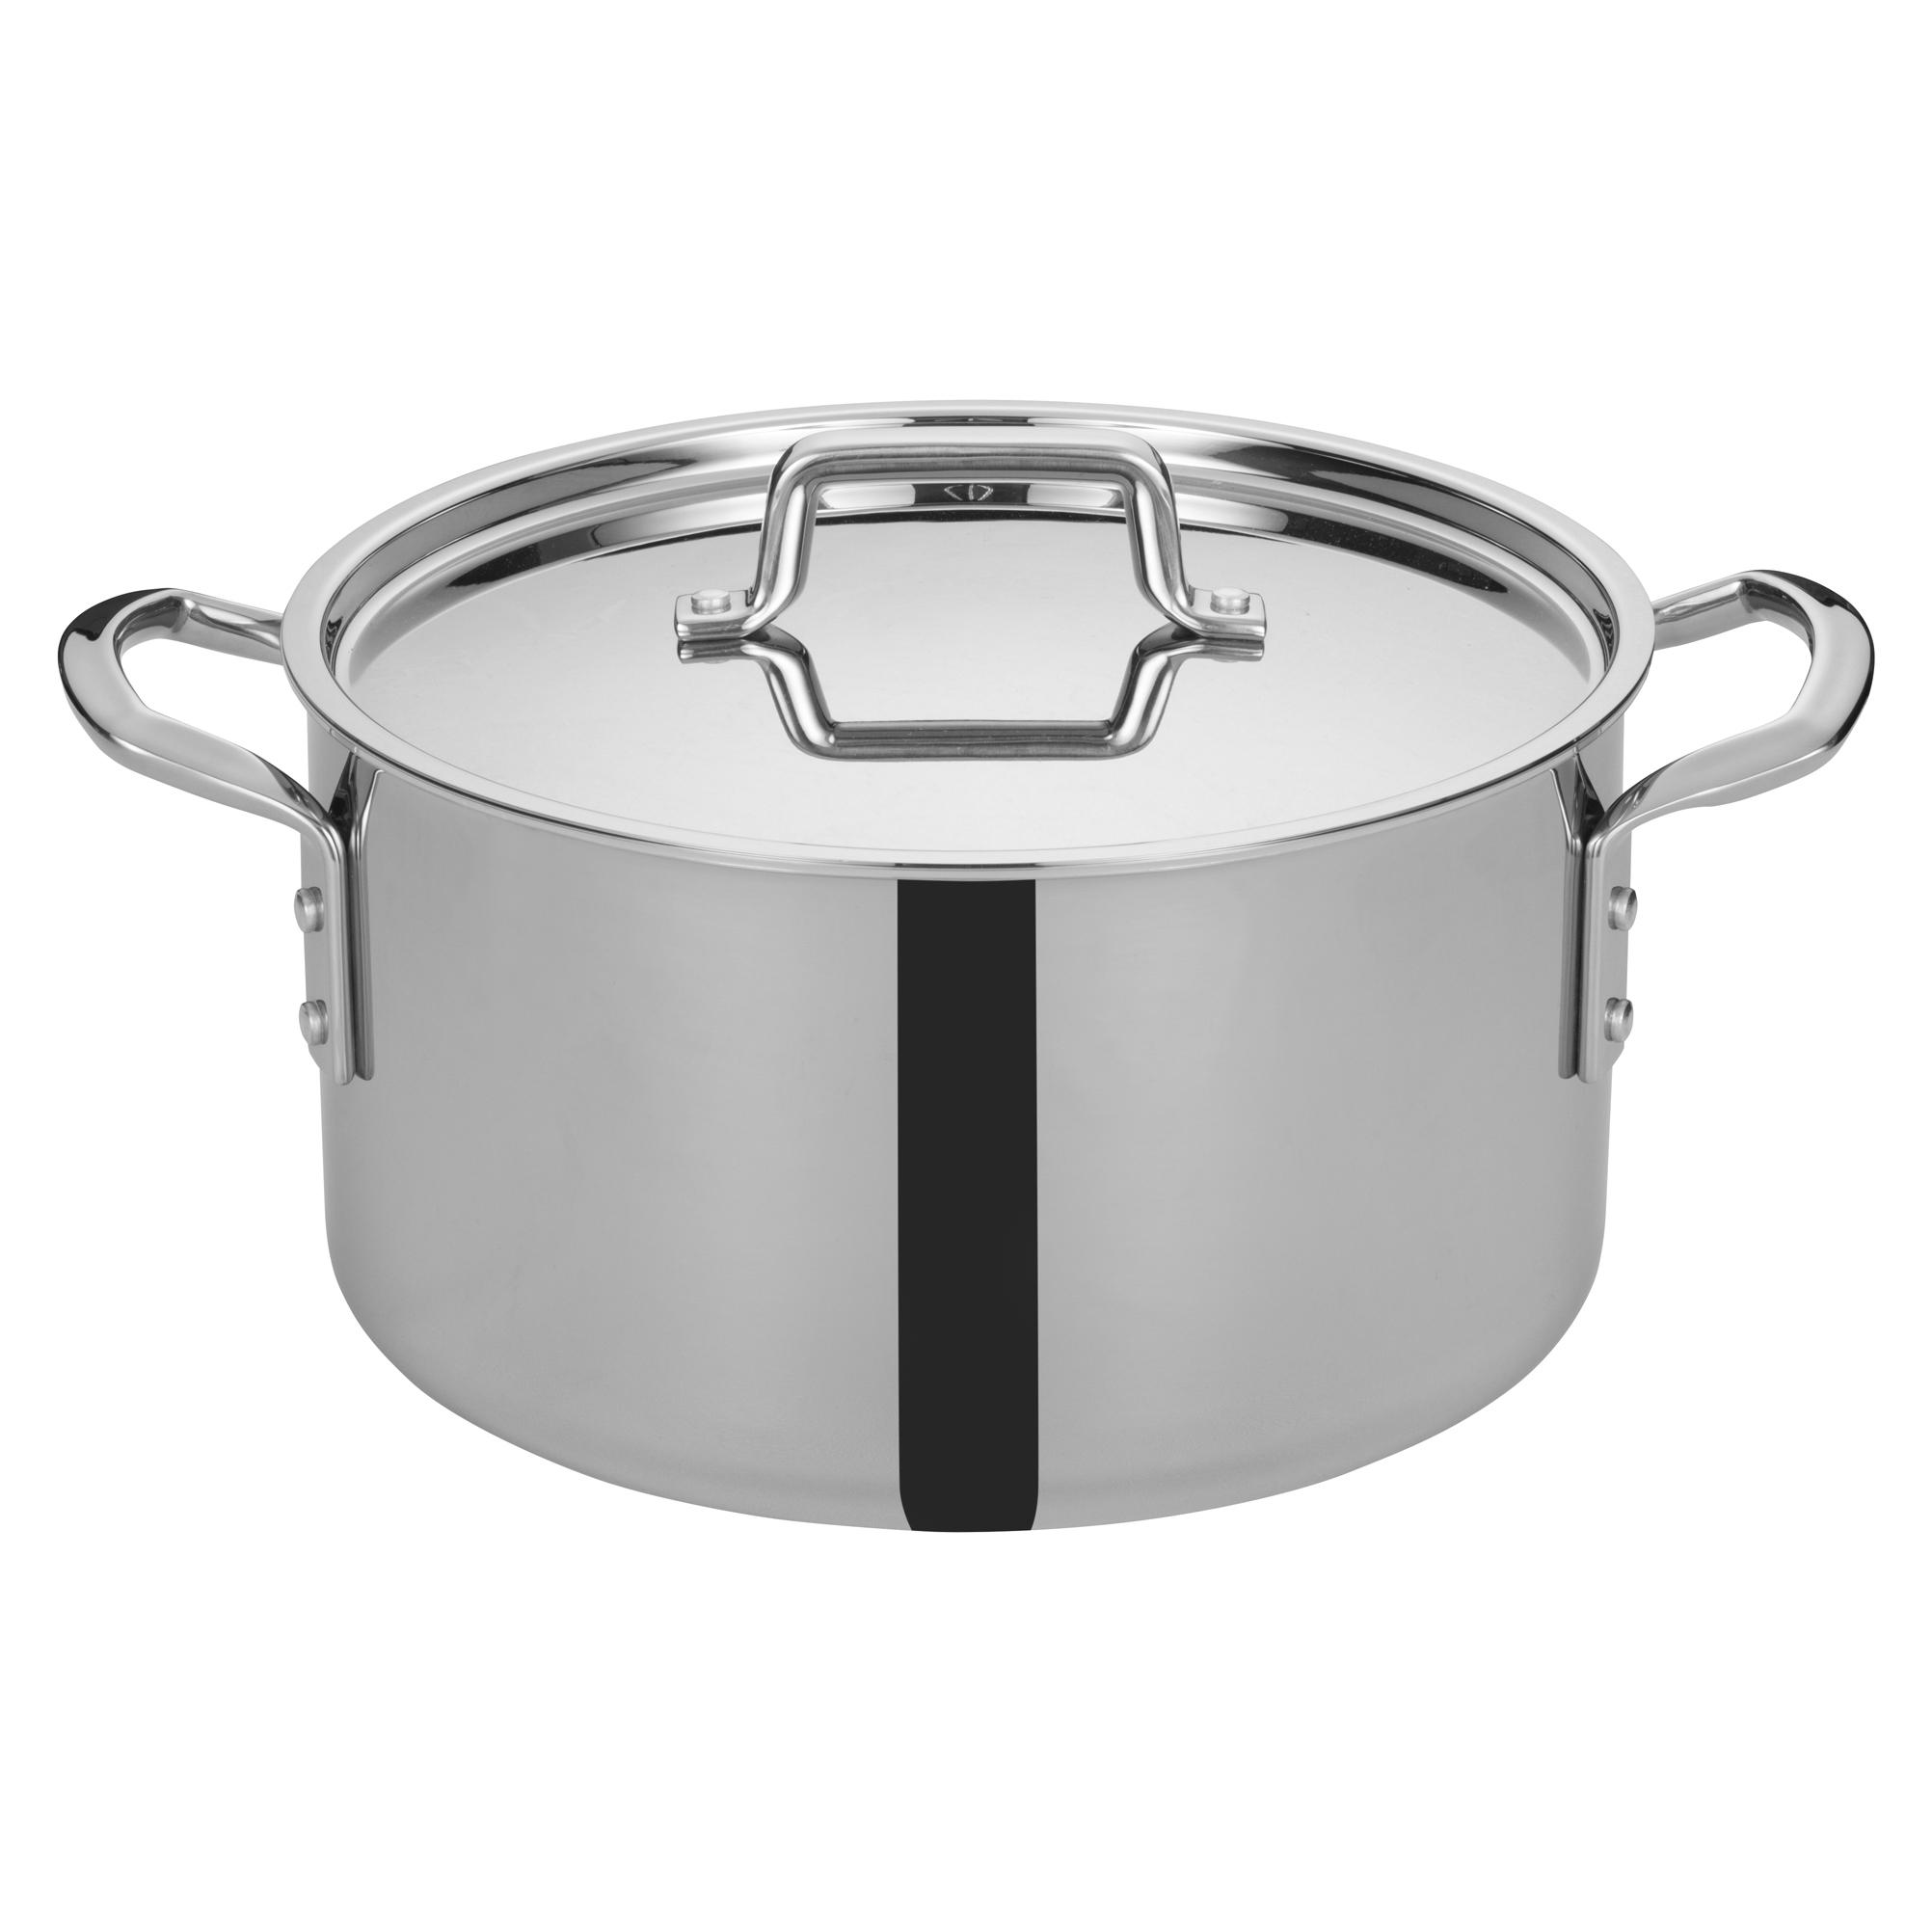 Winco TGSP-12 stock pot